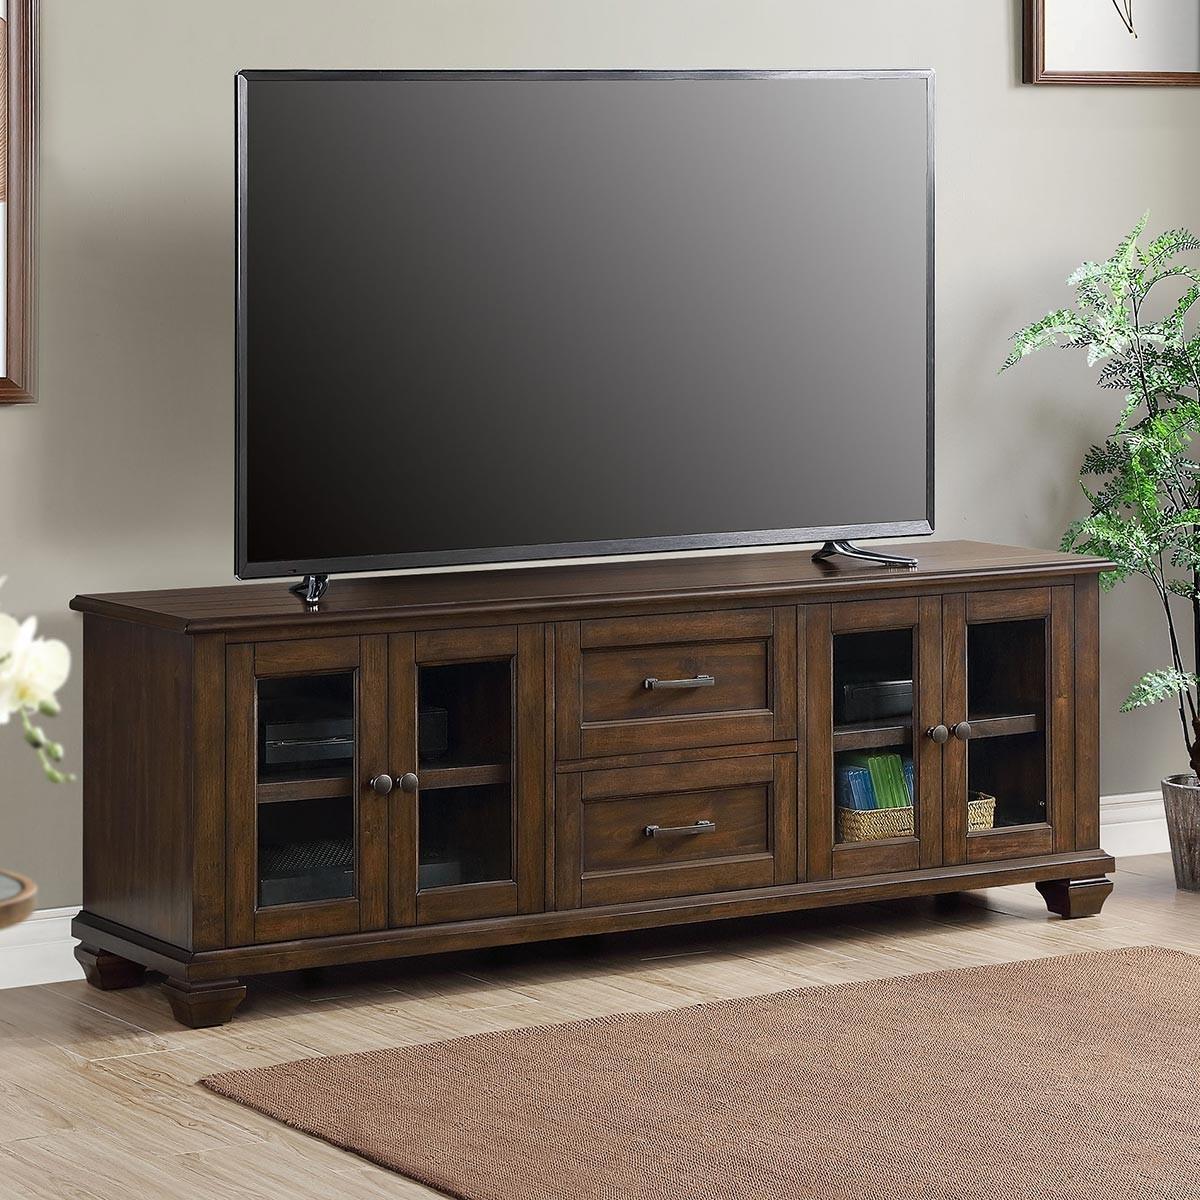 Bayside 電視櫃